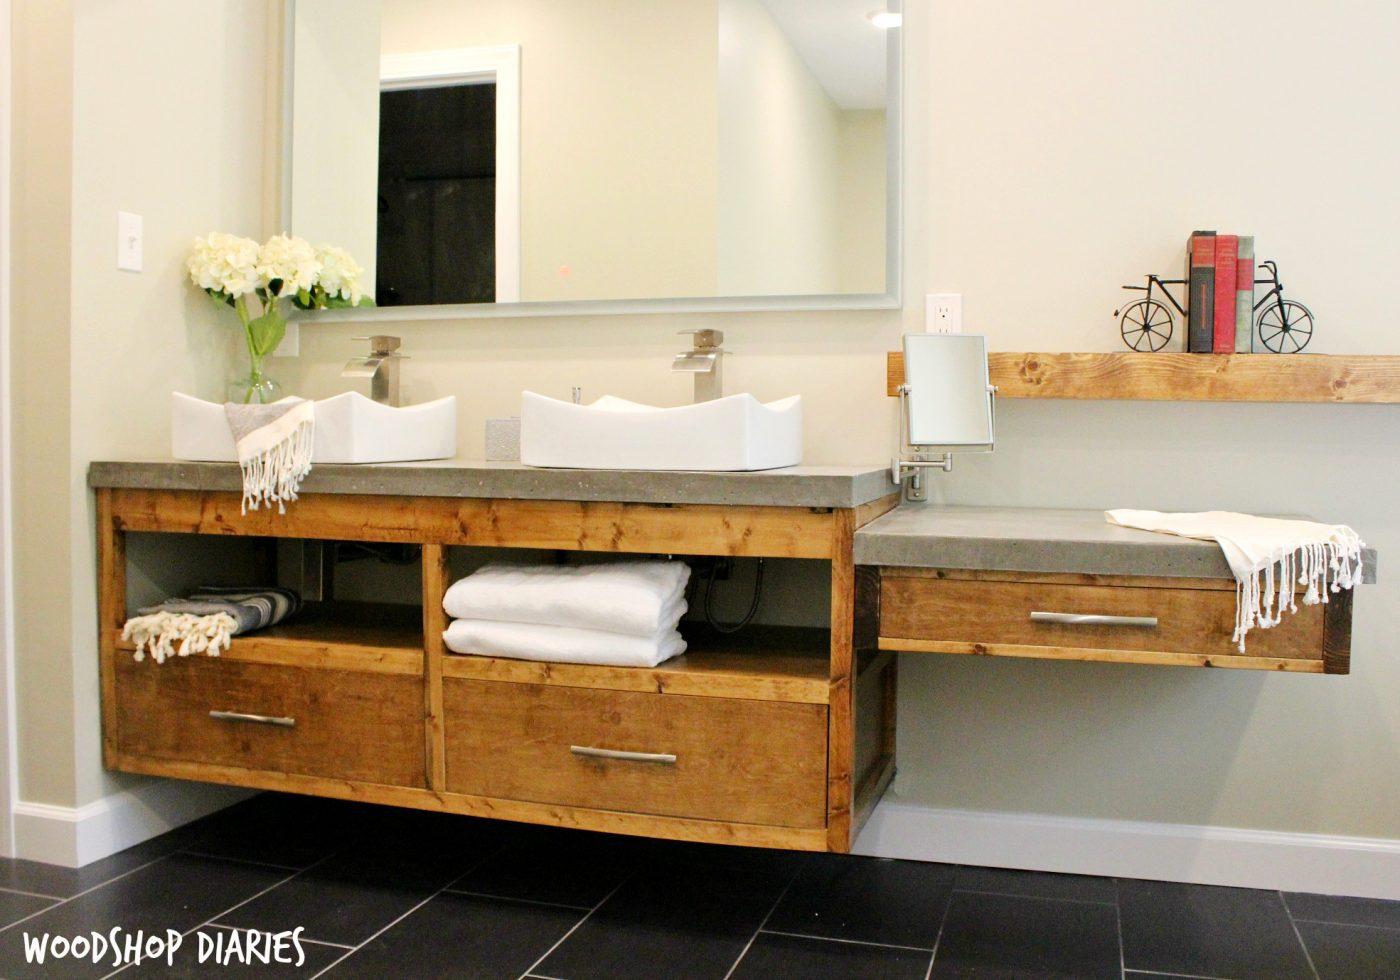 Free Building Plans To Make Your Own Modern DIY Floating Bathroom Vanity.  Plenty Of Storage Part 58